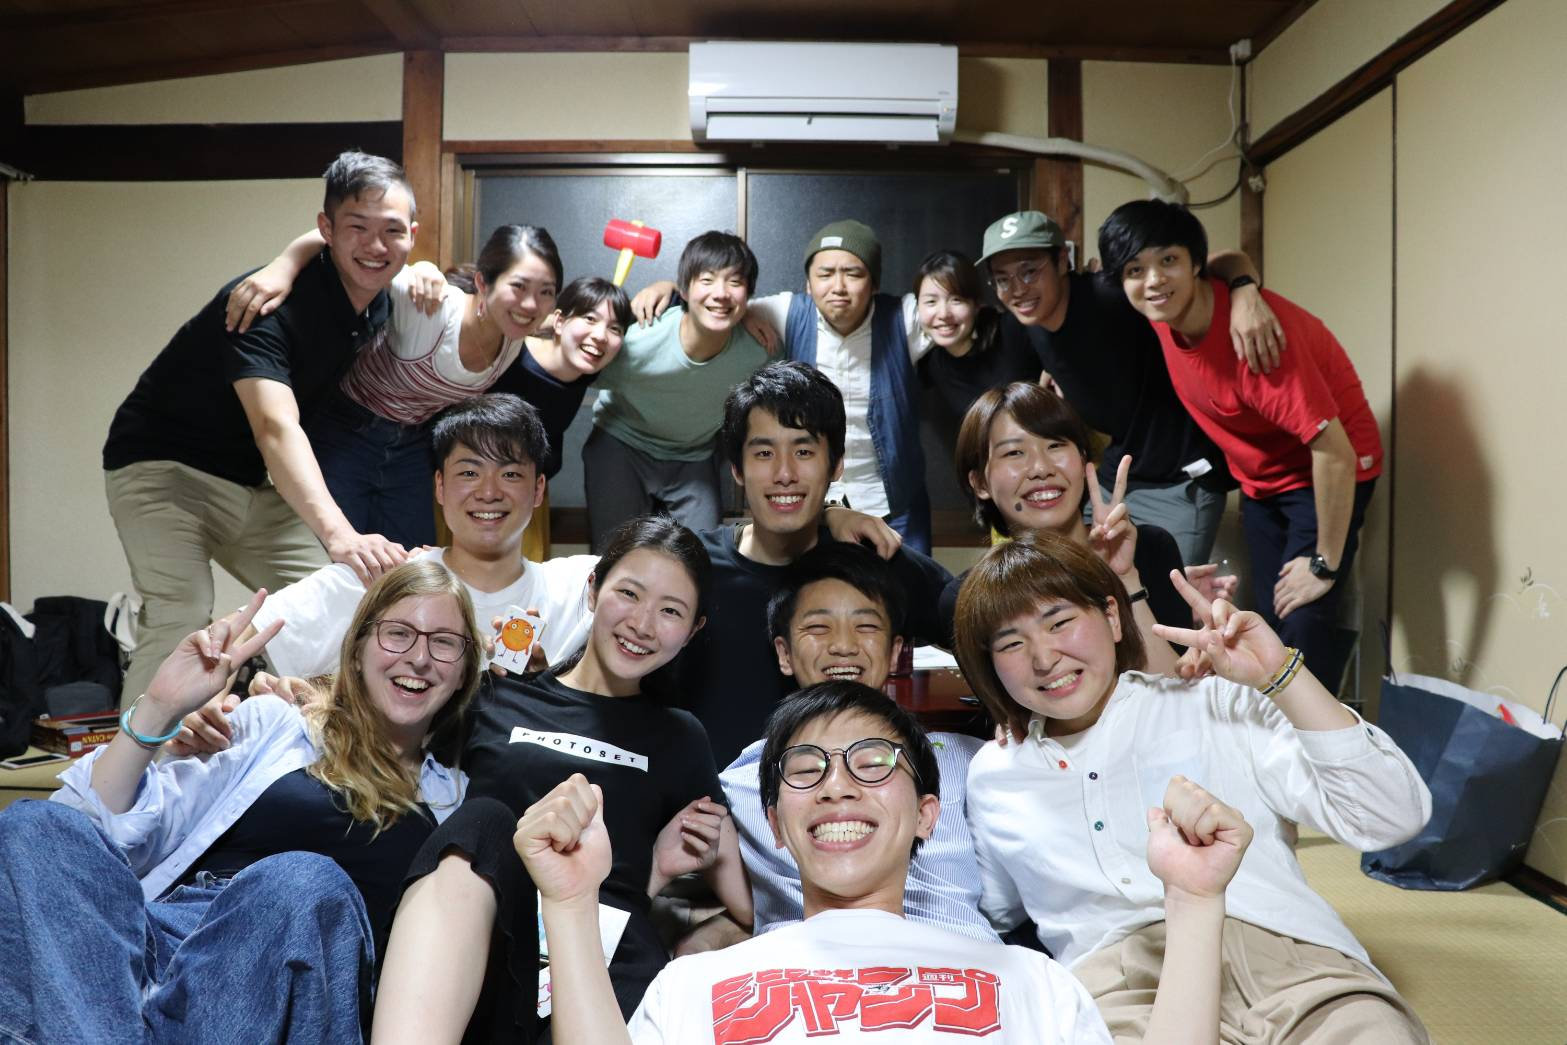 Syumirun! しゅみるん 誕生日 パーティー